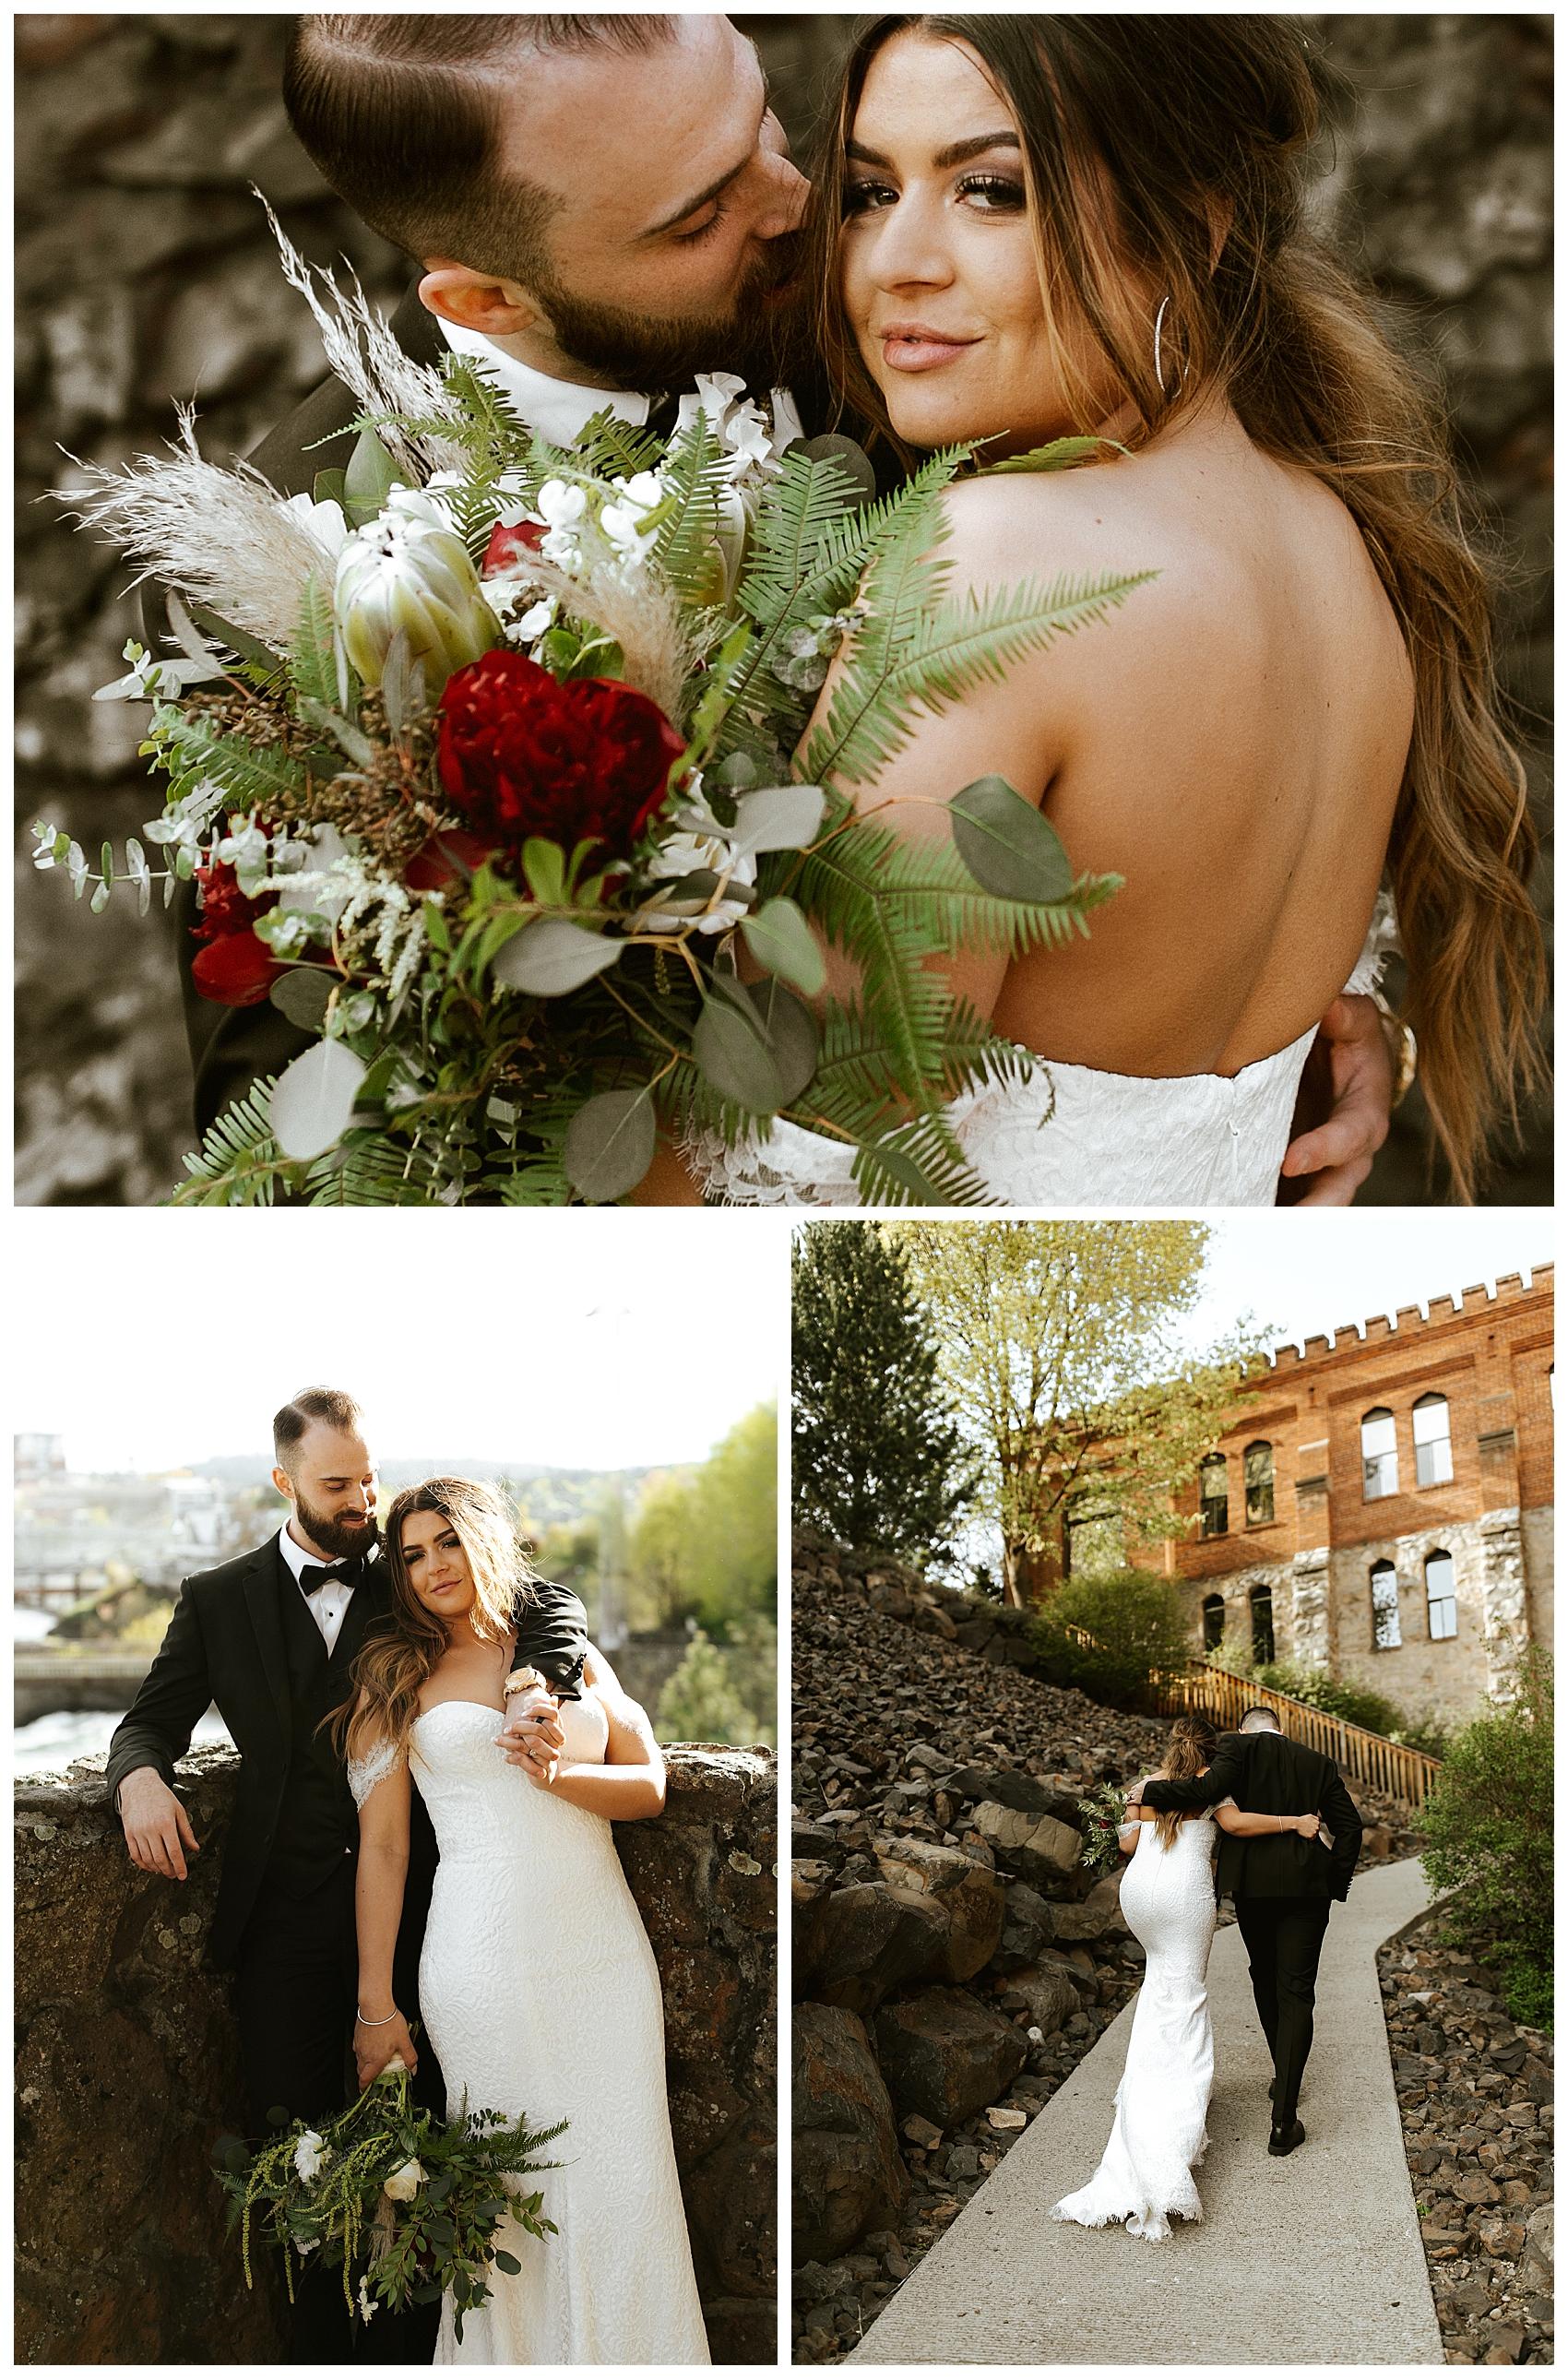 Chateau Rive Spokane Wedding Cassie Trottier Photography01000.jpg